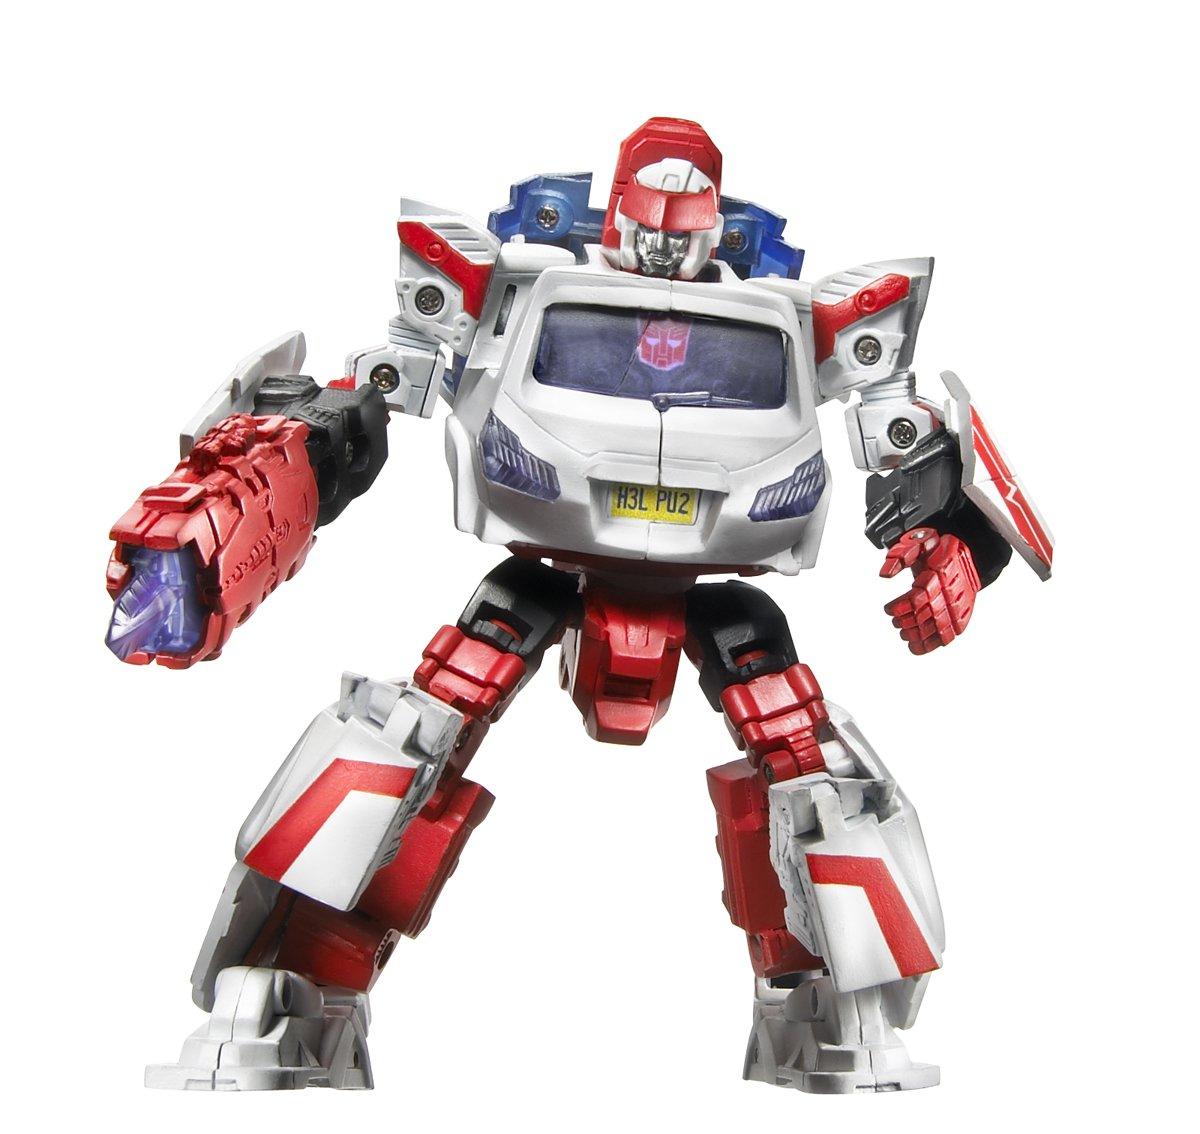 Autobot Ratchet - Transformers Toys - TFW2005